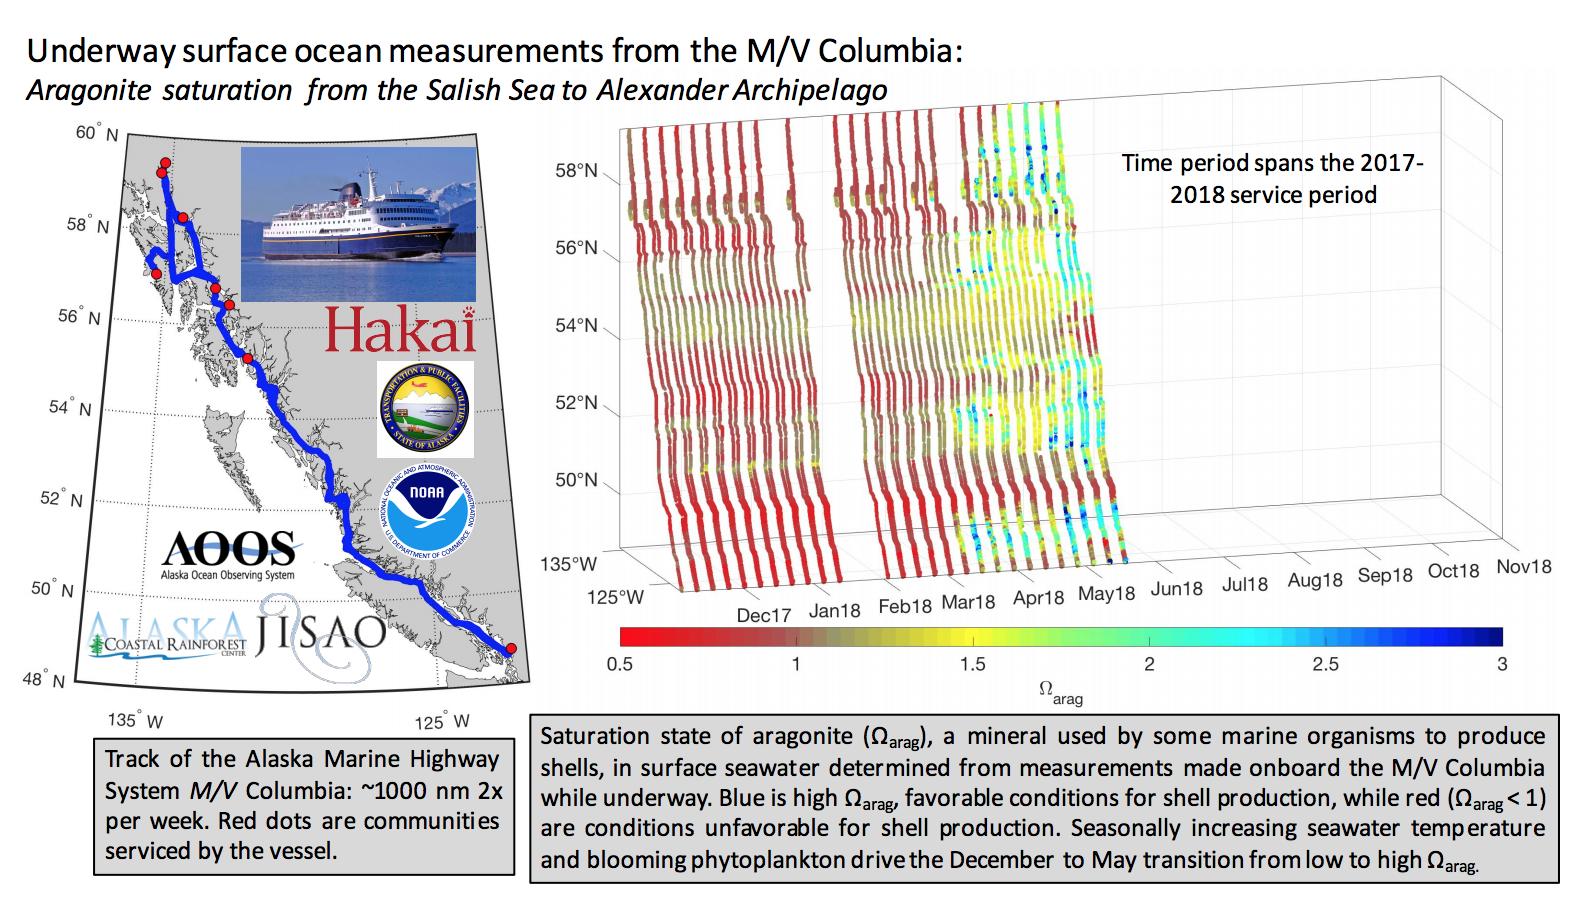 Data from state ferry in Southeast Alaska illuminates seasonal